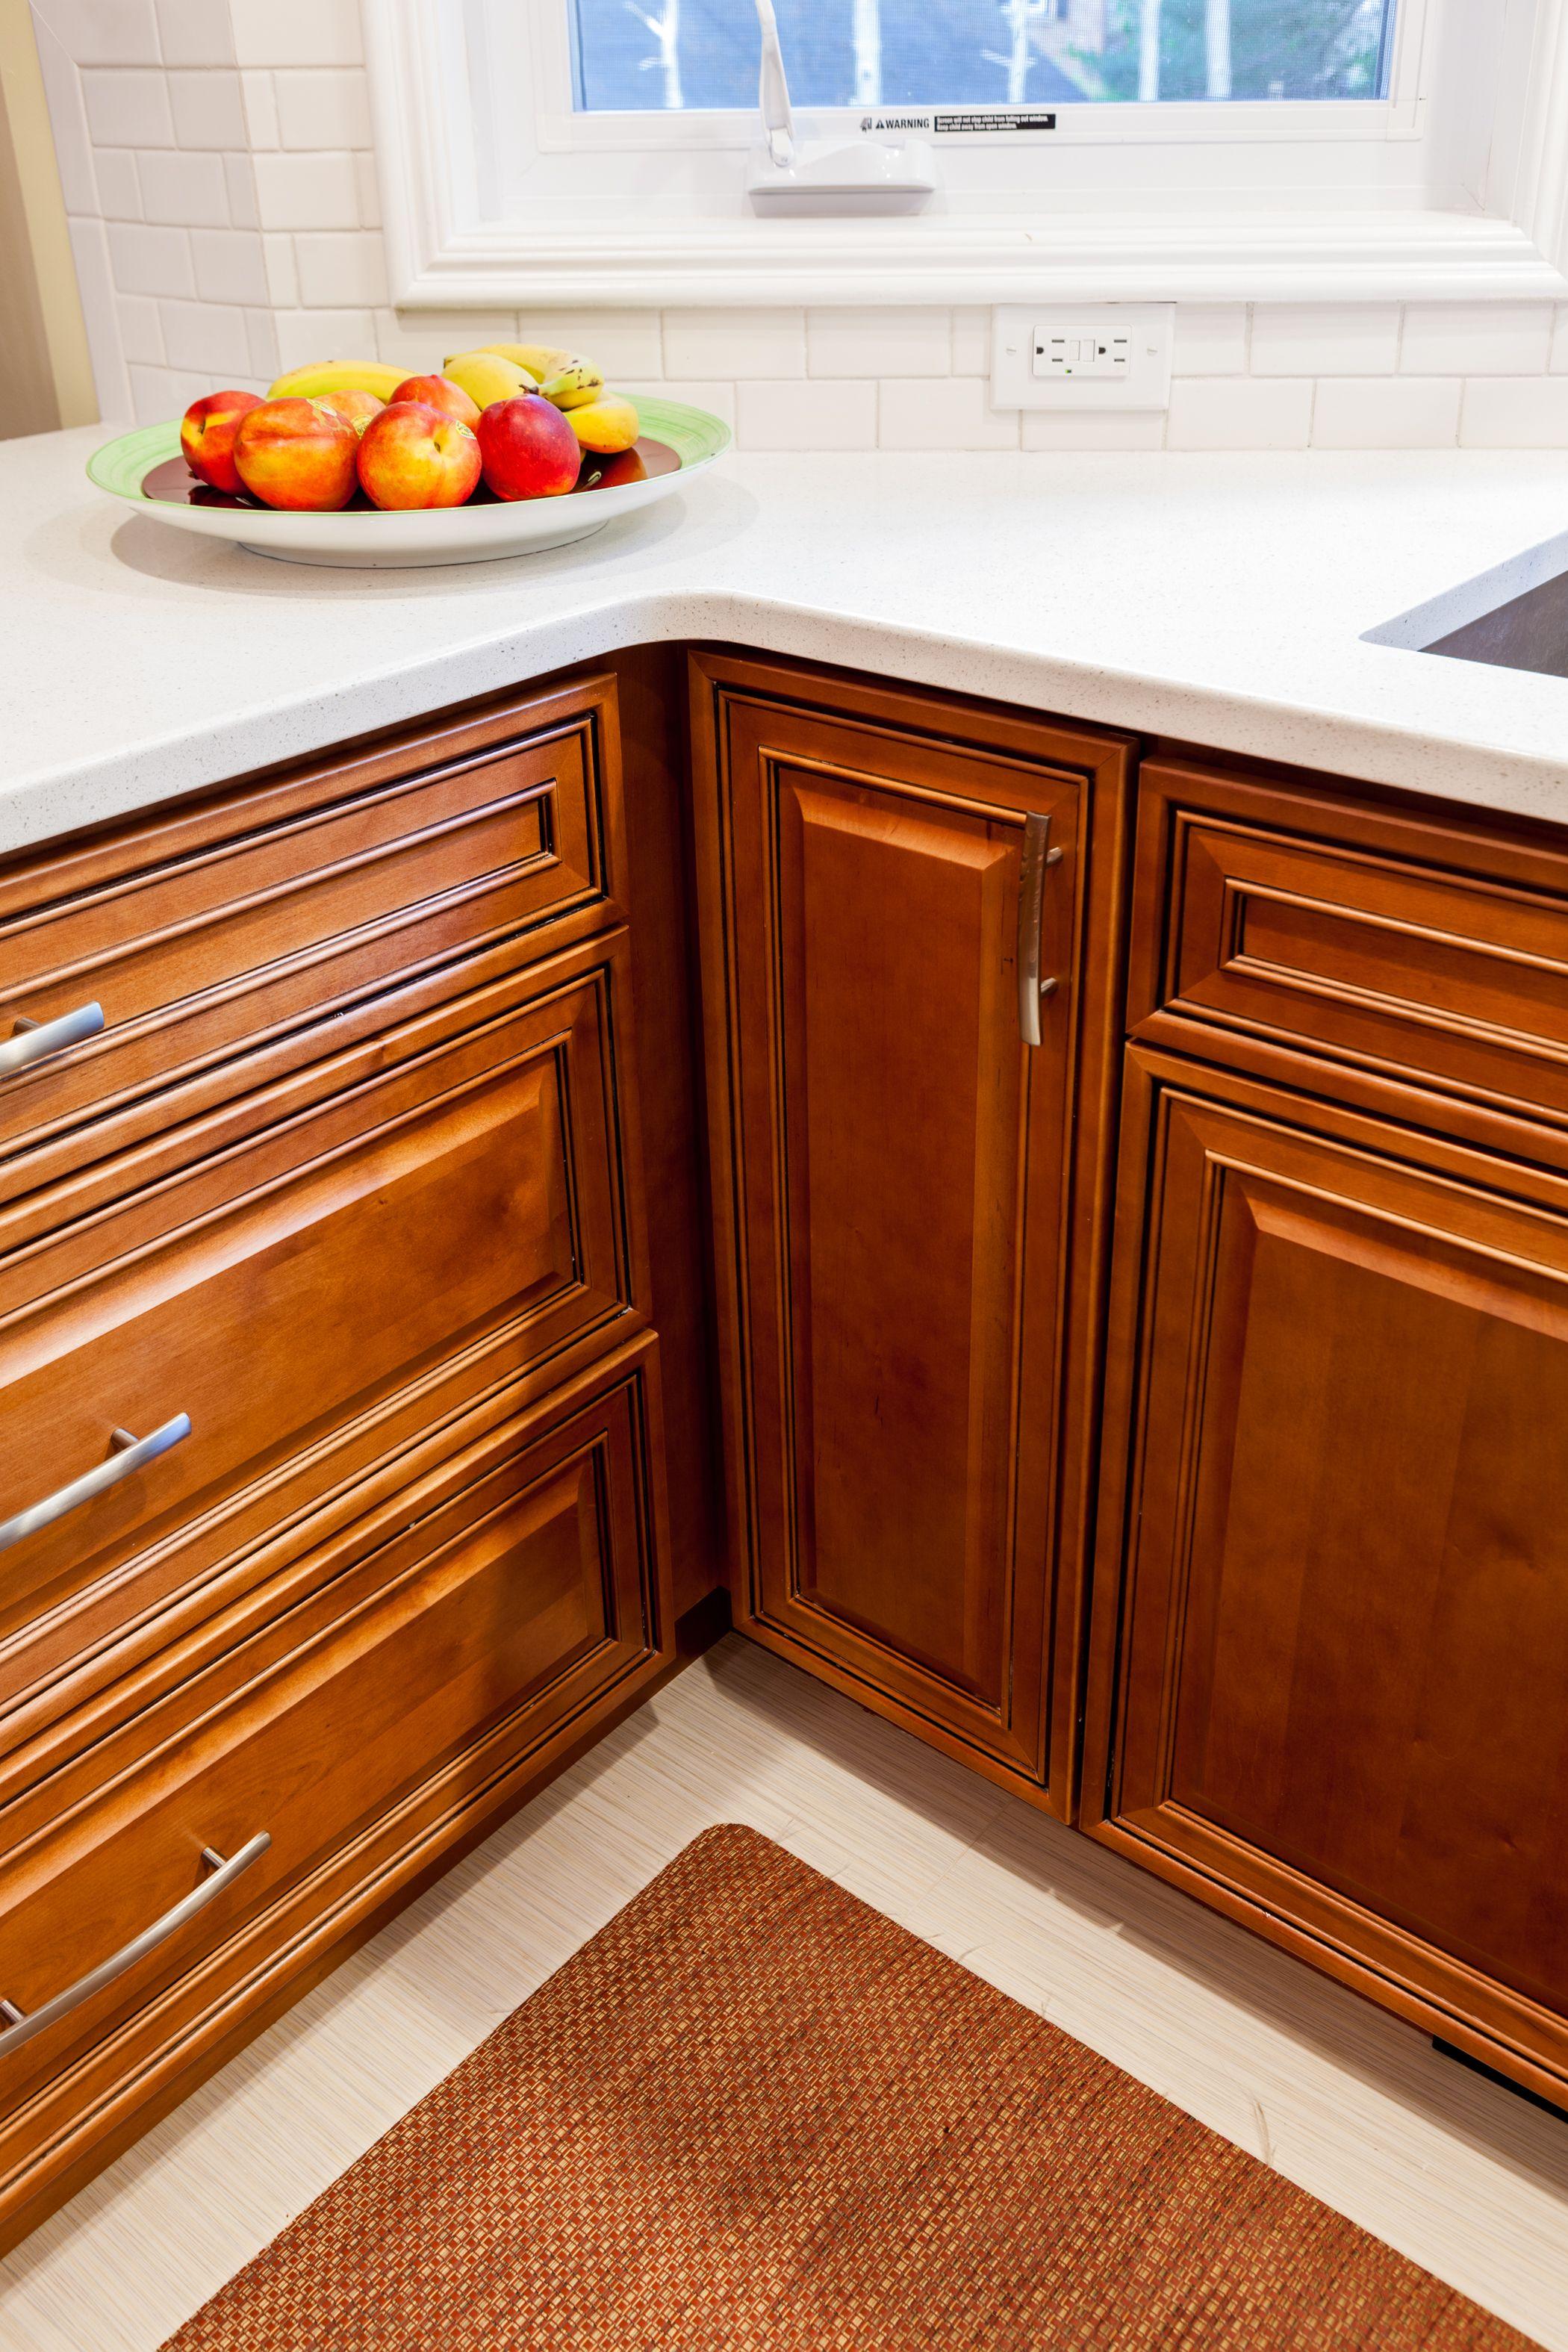 J K Mocha Glazed Traditional Maple Wood Cabinets Style K10 Cabinetry Wood Cabinets Traditional Cabinets